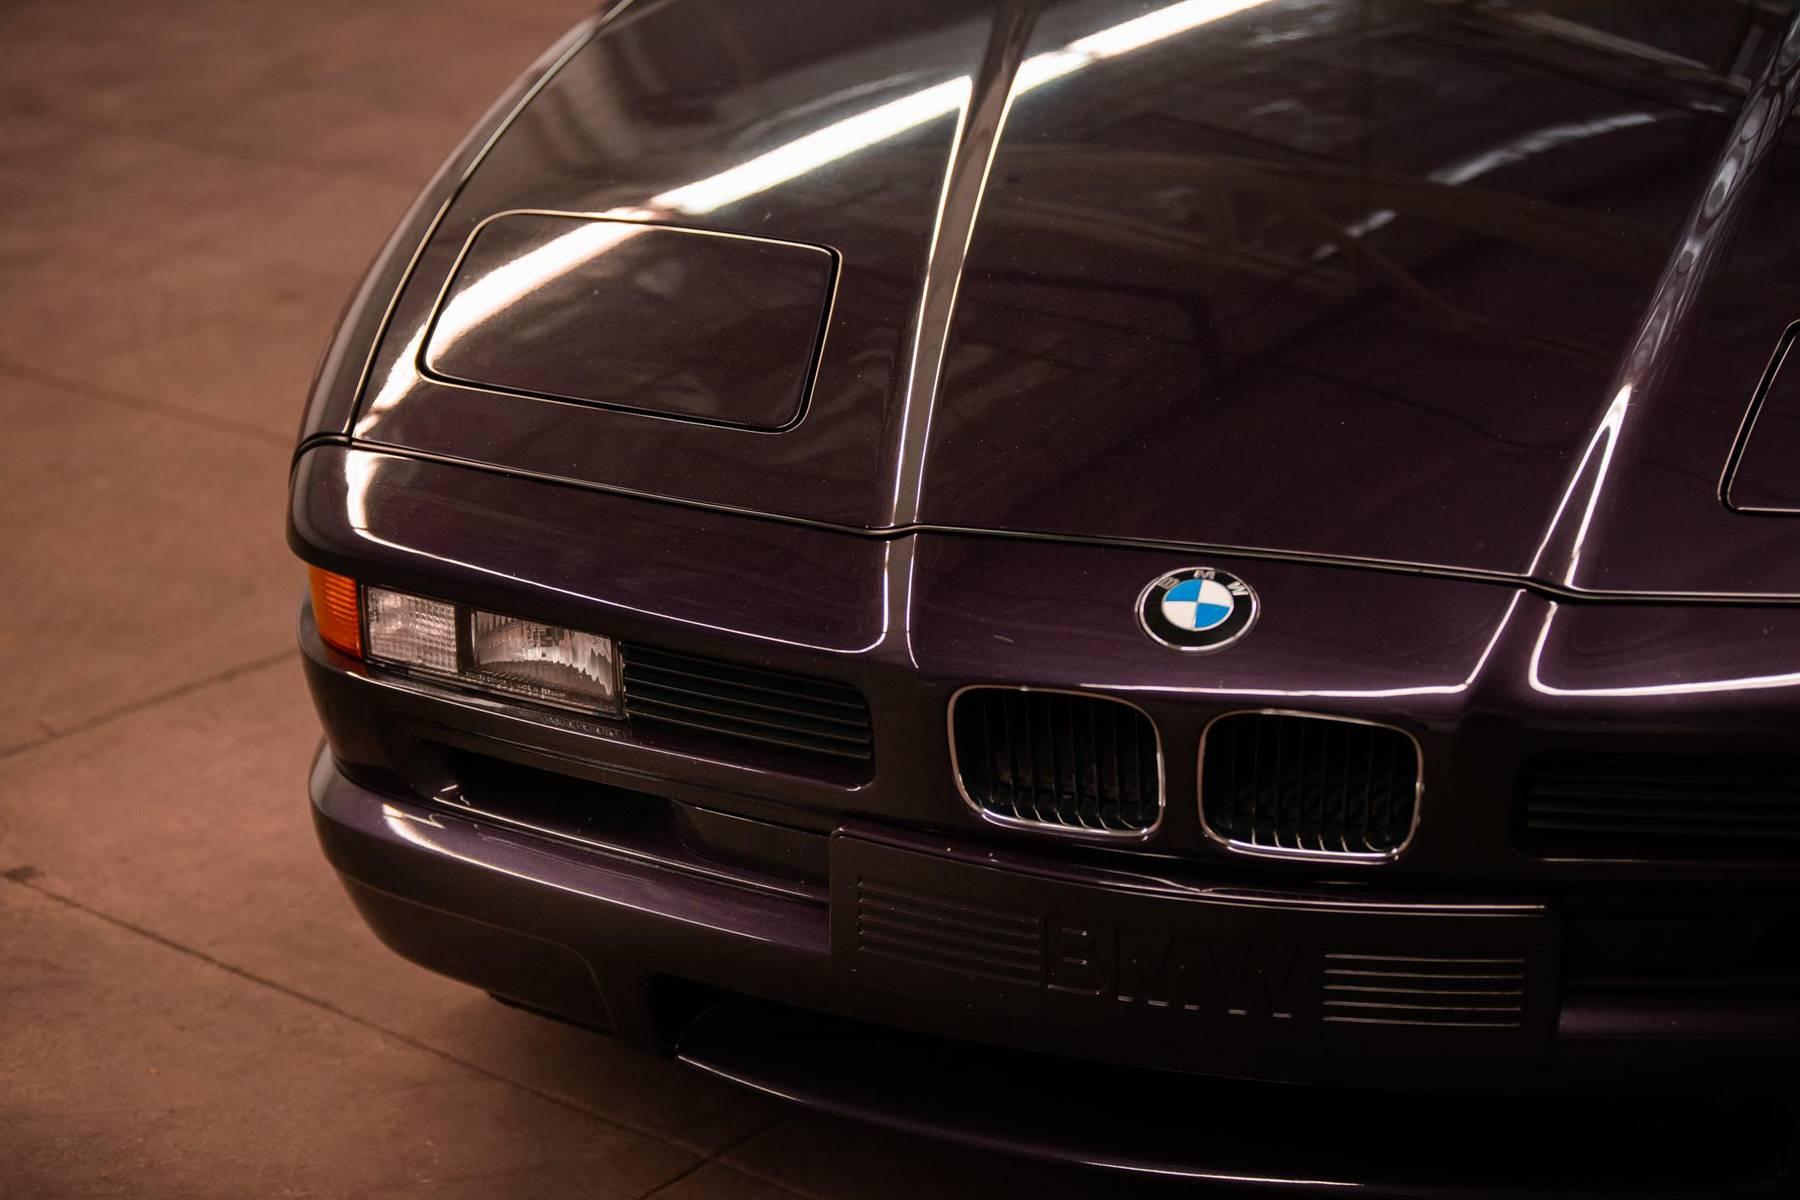 1995 BMW 850CSi front